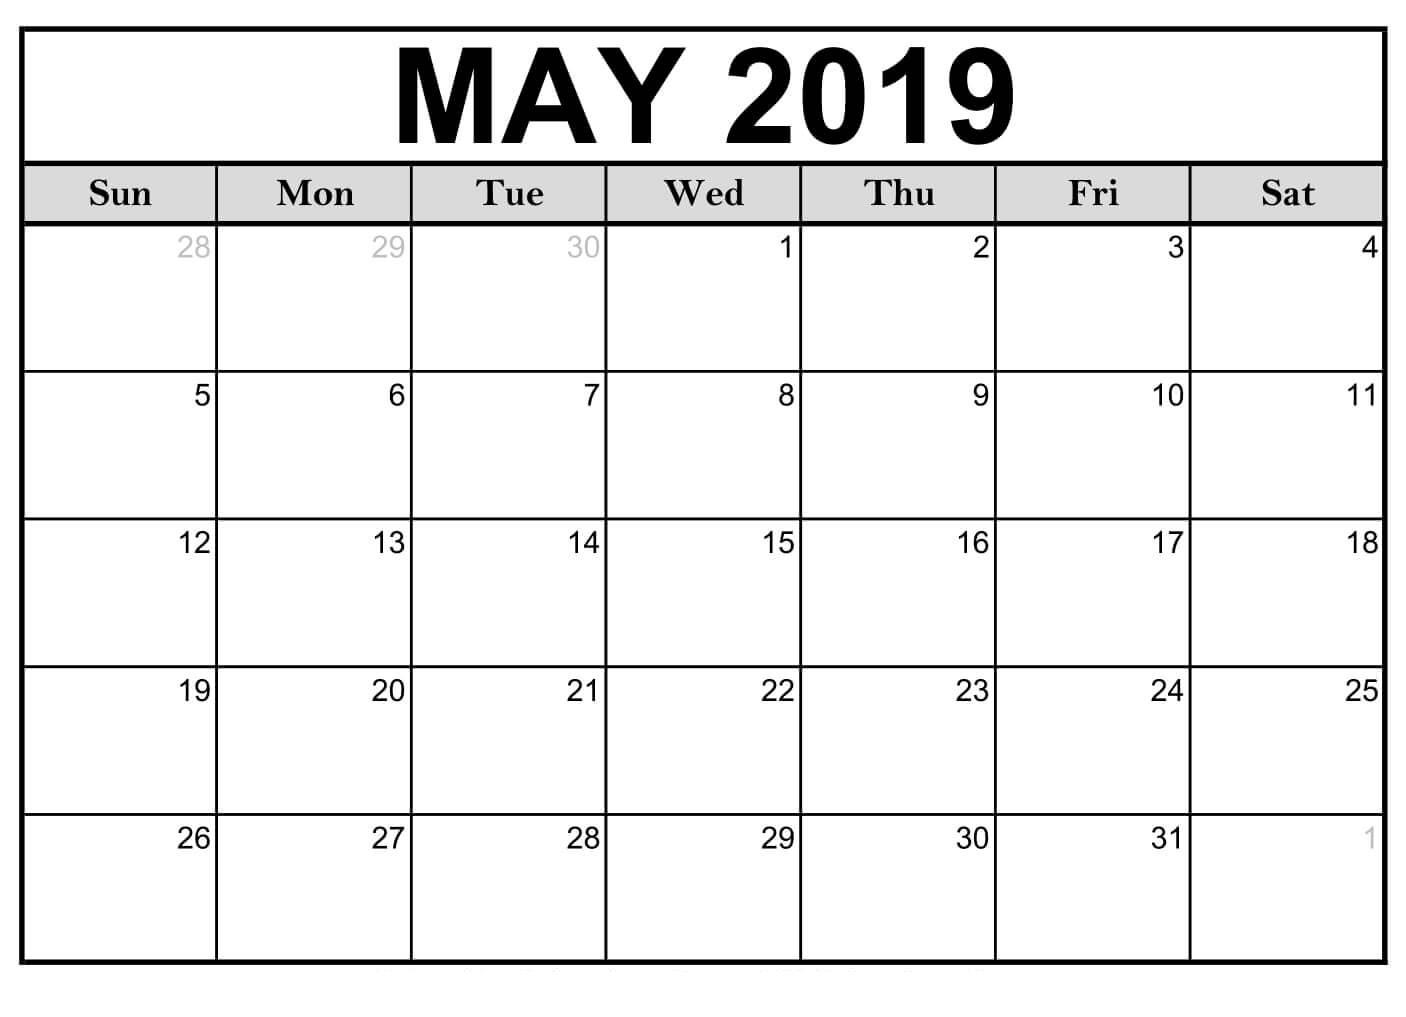 May Calendar 2019 Printable - Printable Calendar Templates Blank